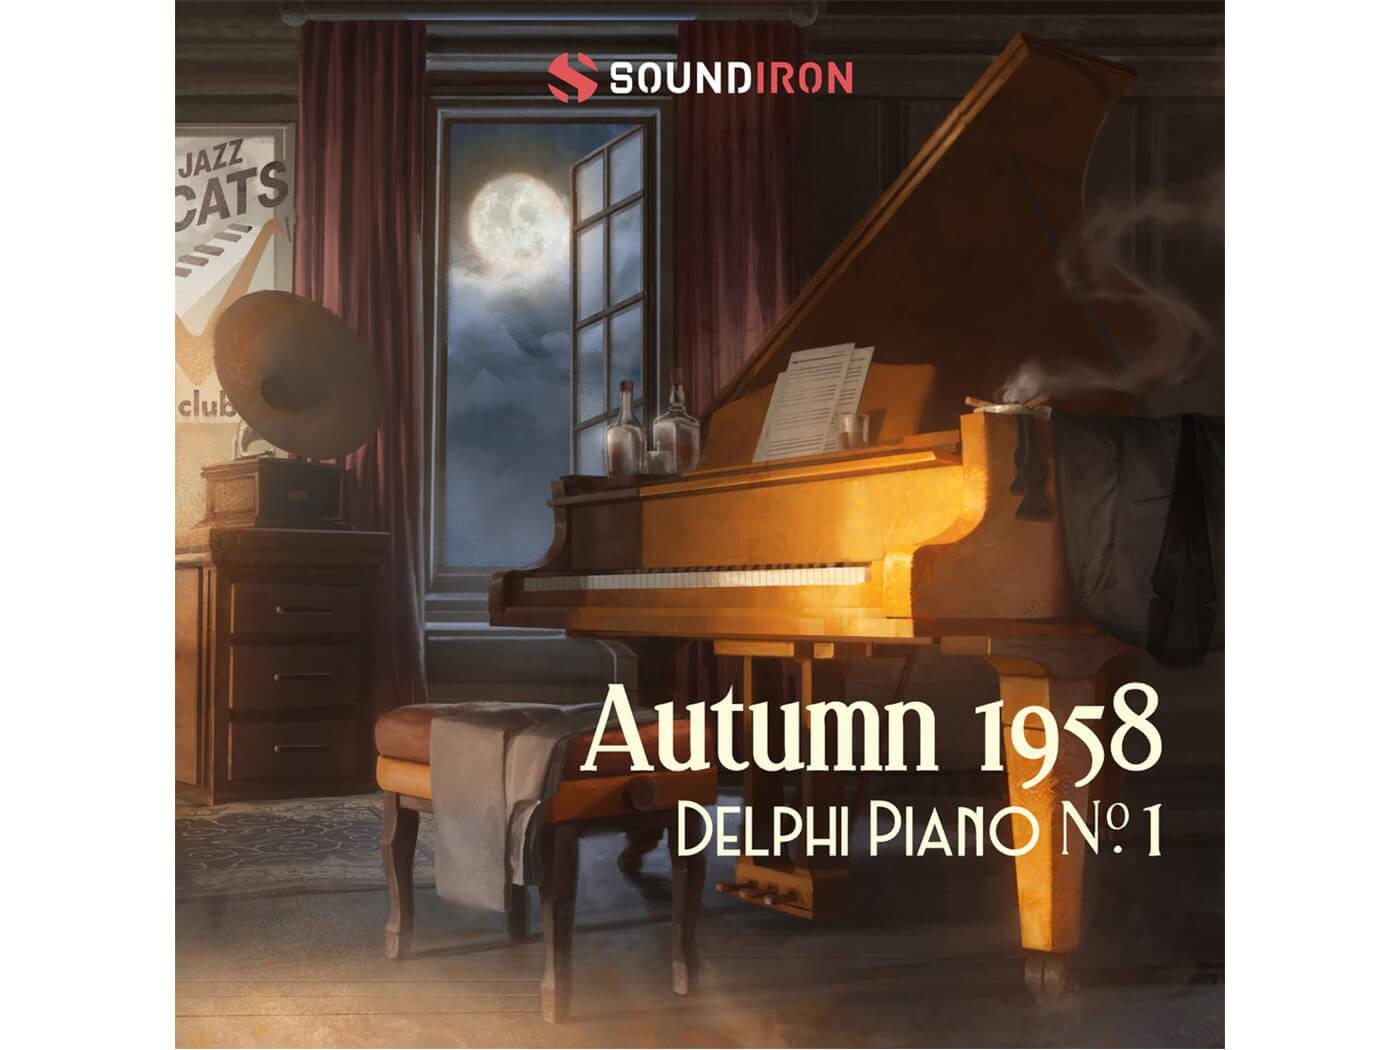 Soundiron - Delphi Piano #1: Autumn 1958